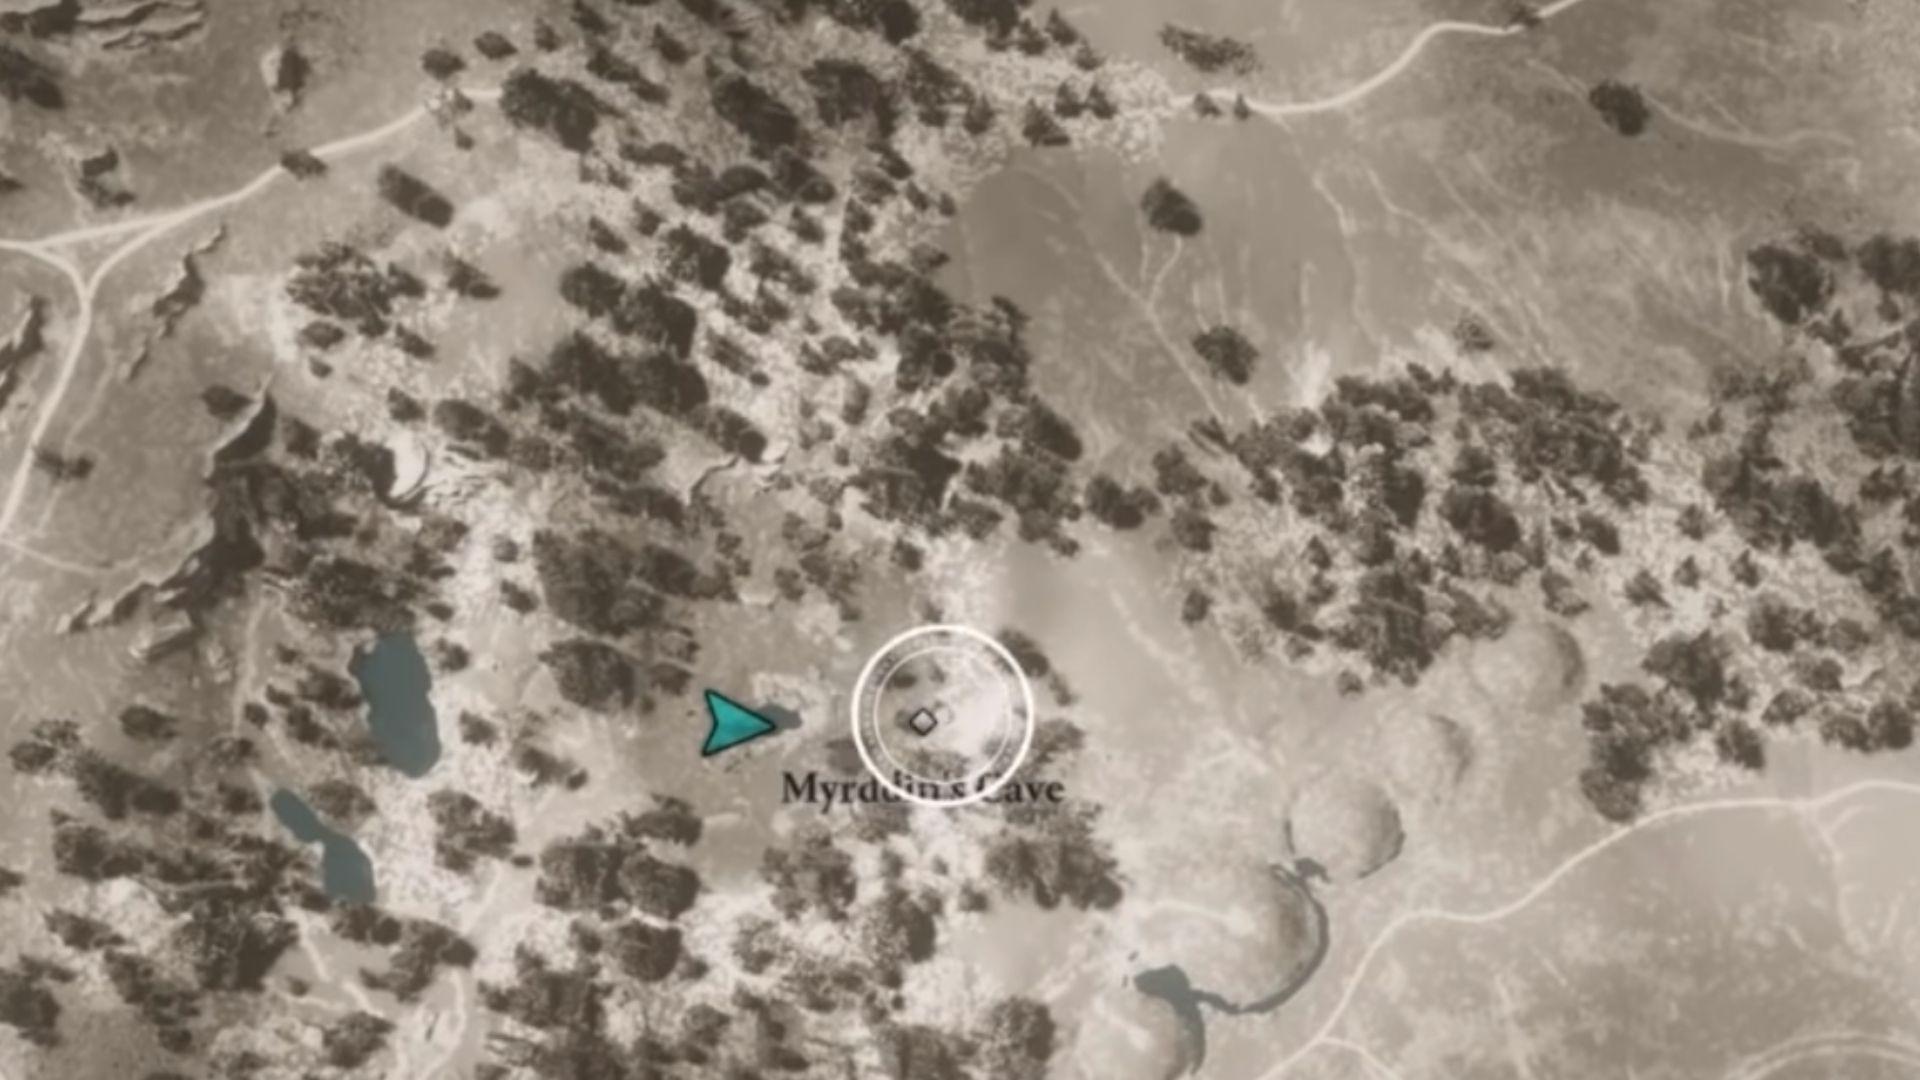 Myrddin's Cave location